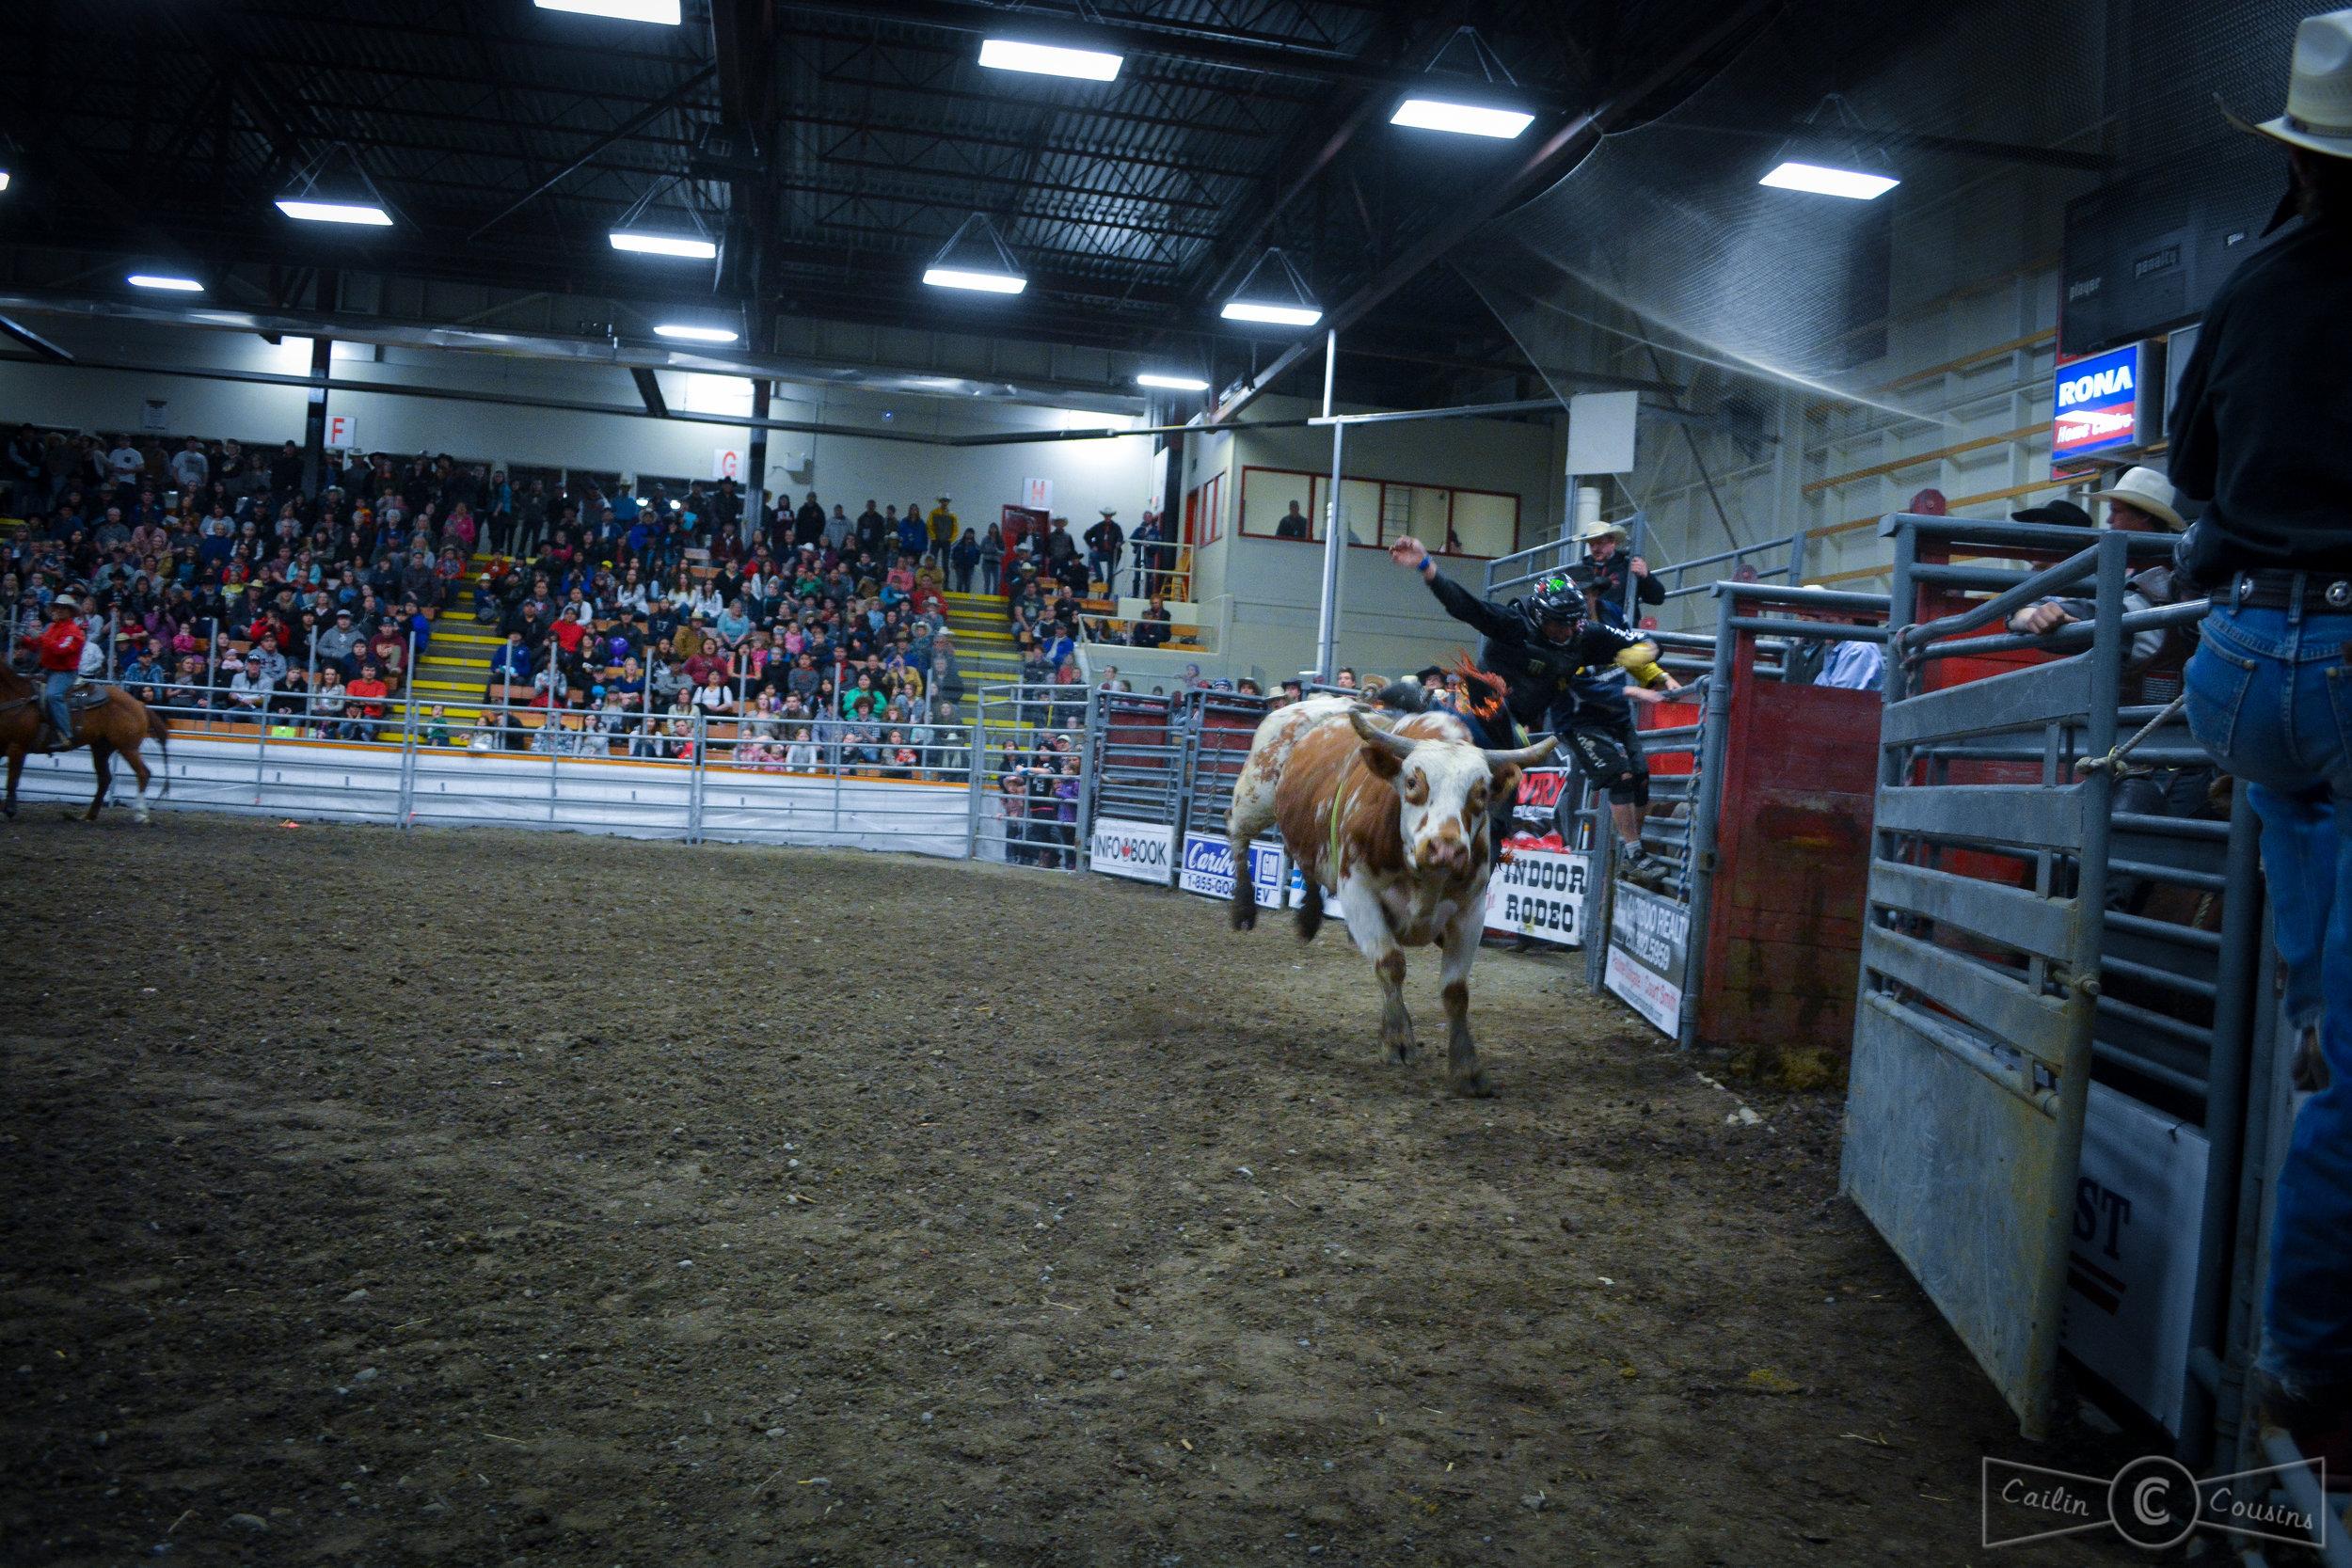 051715_rodeo_cc-3.jpg